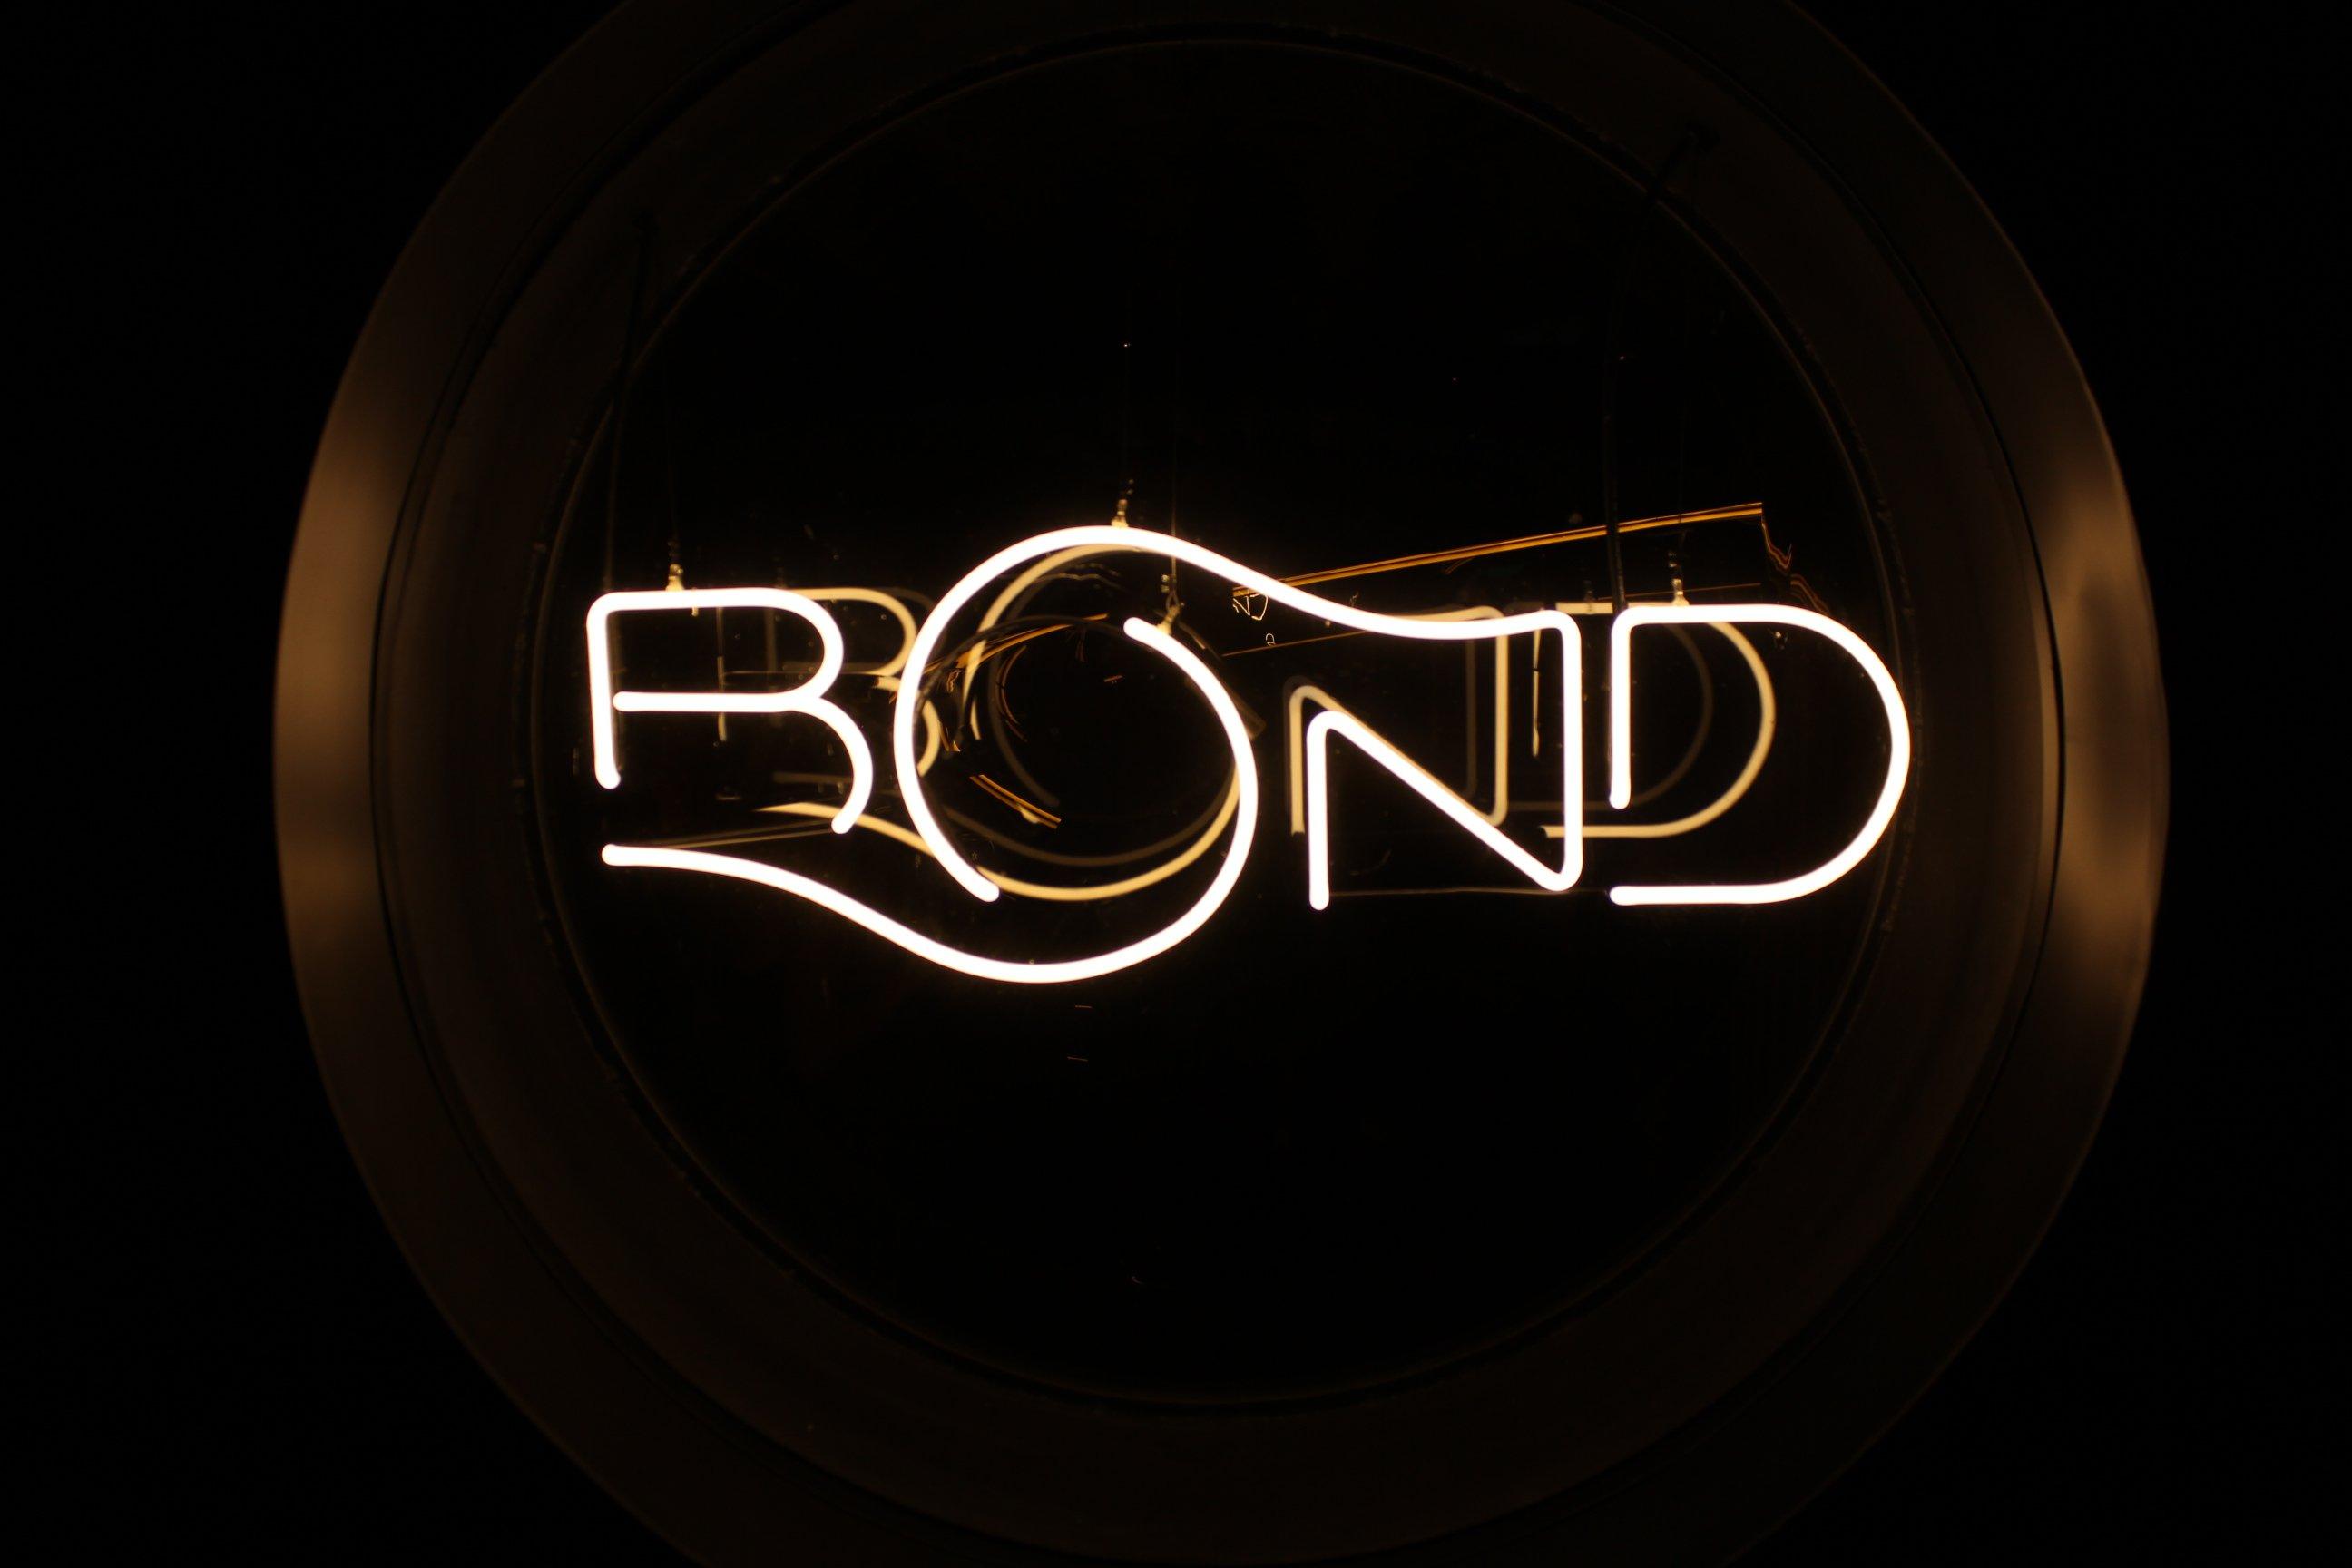 SPECTRE BOND 24 james action spy crime thriller mystery ...